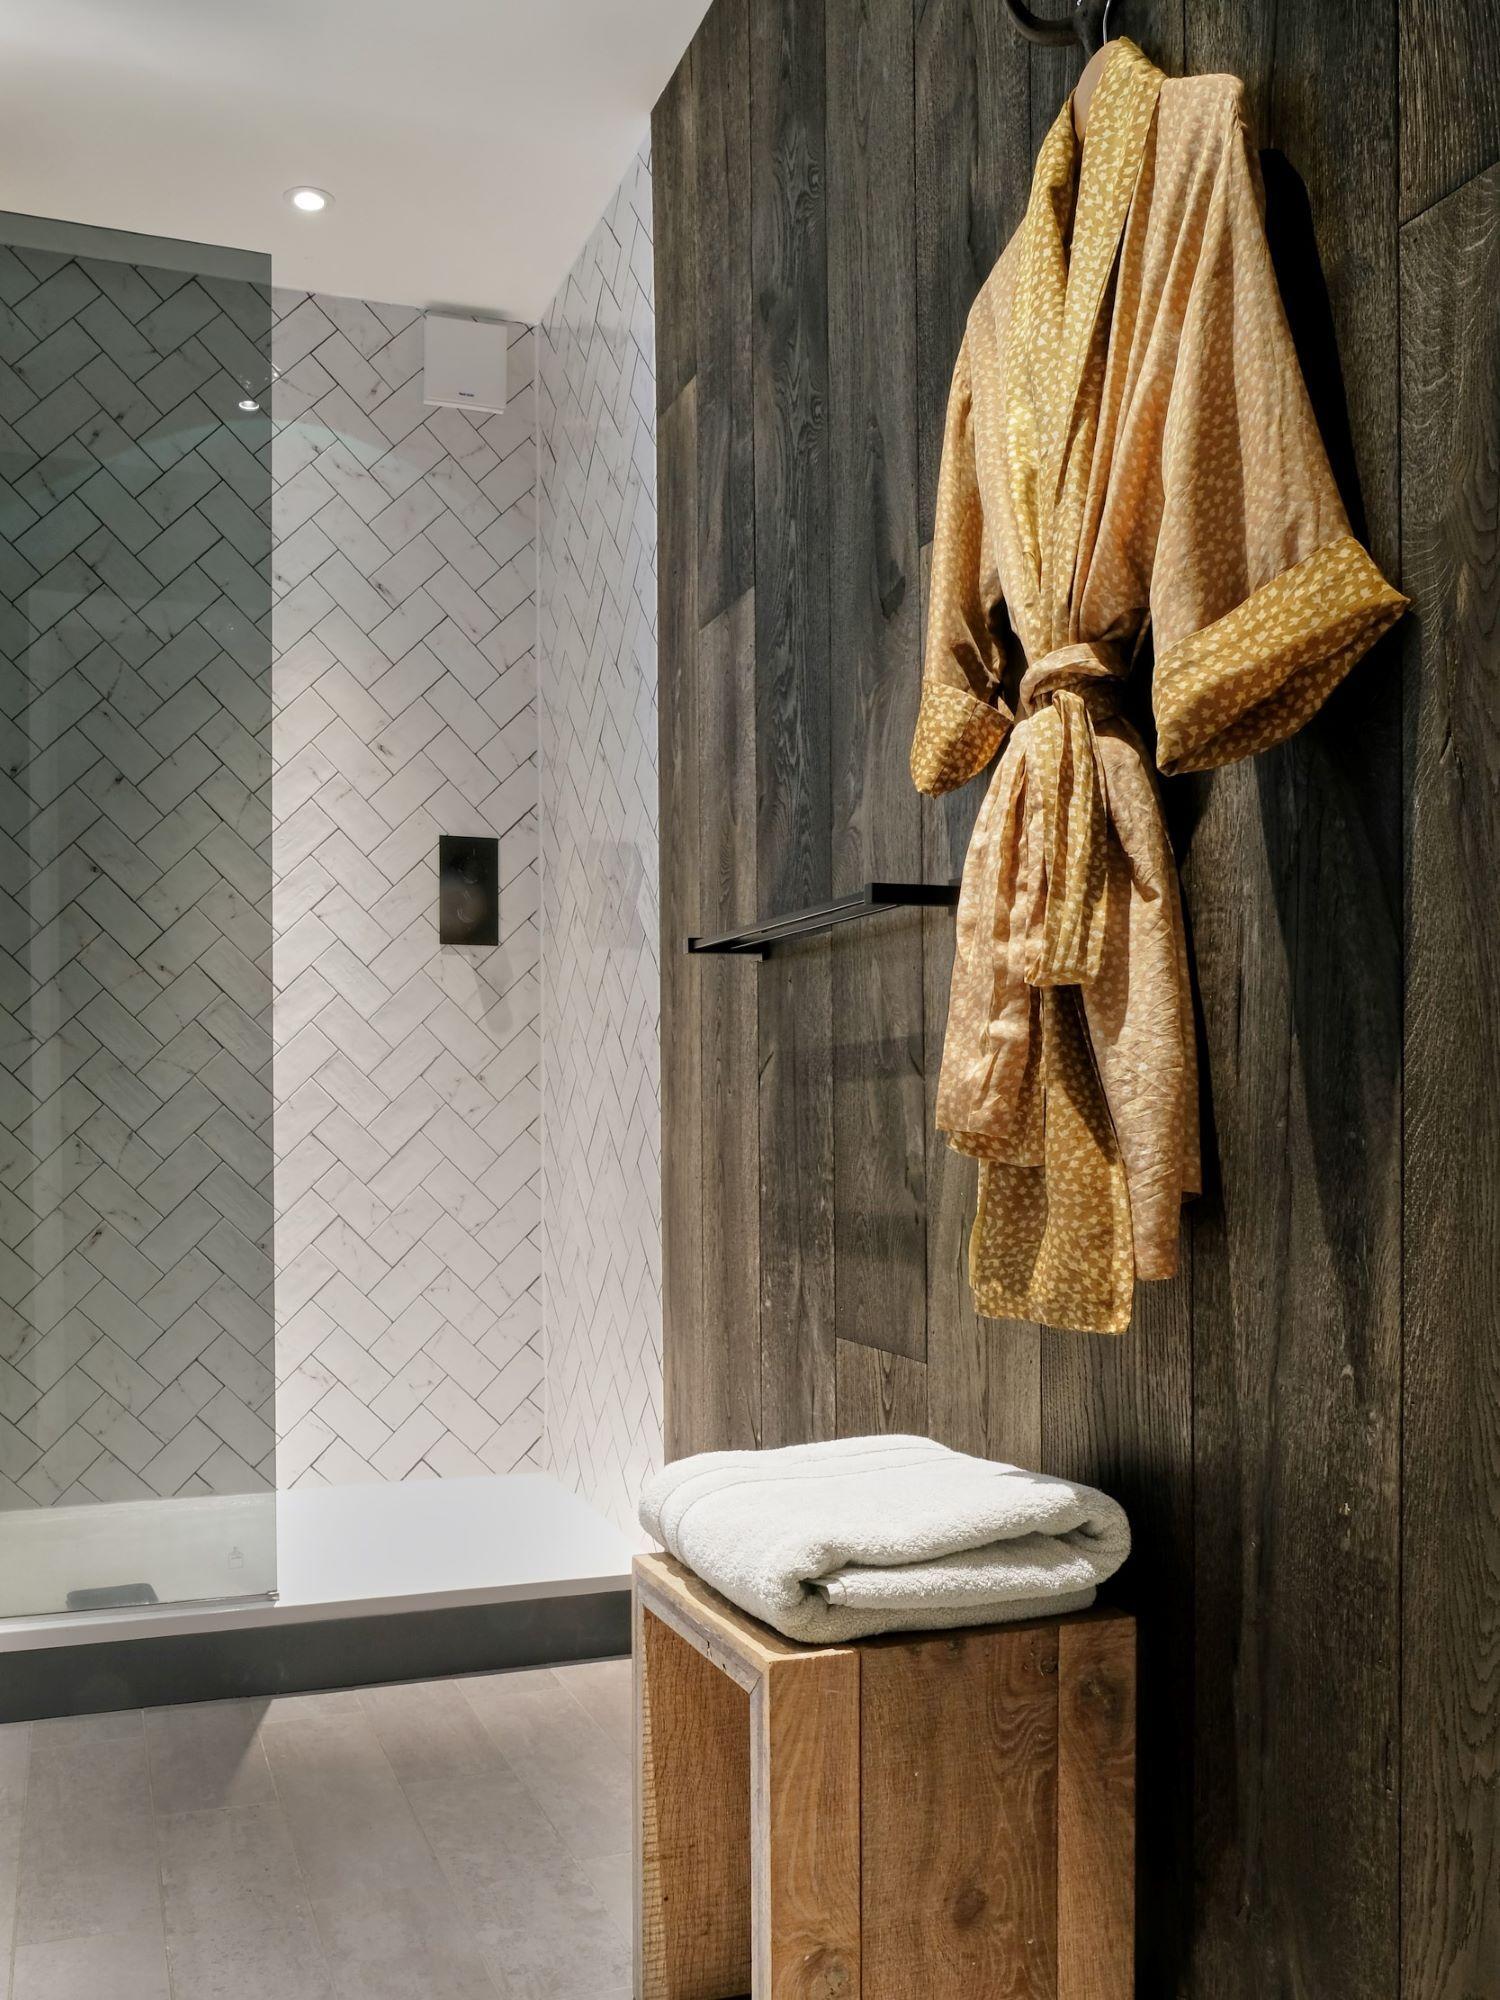 Magma mayon dark textured oak wallcladding in bathroom with brown kimono